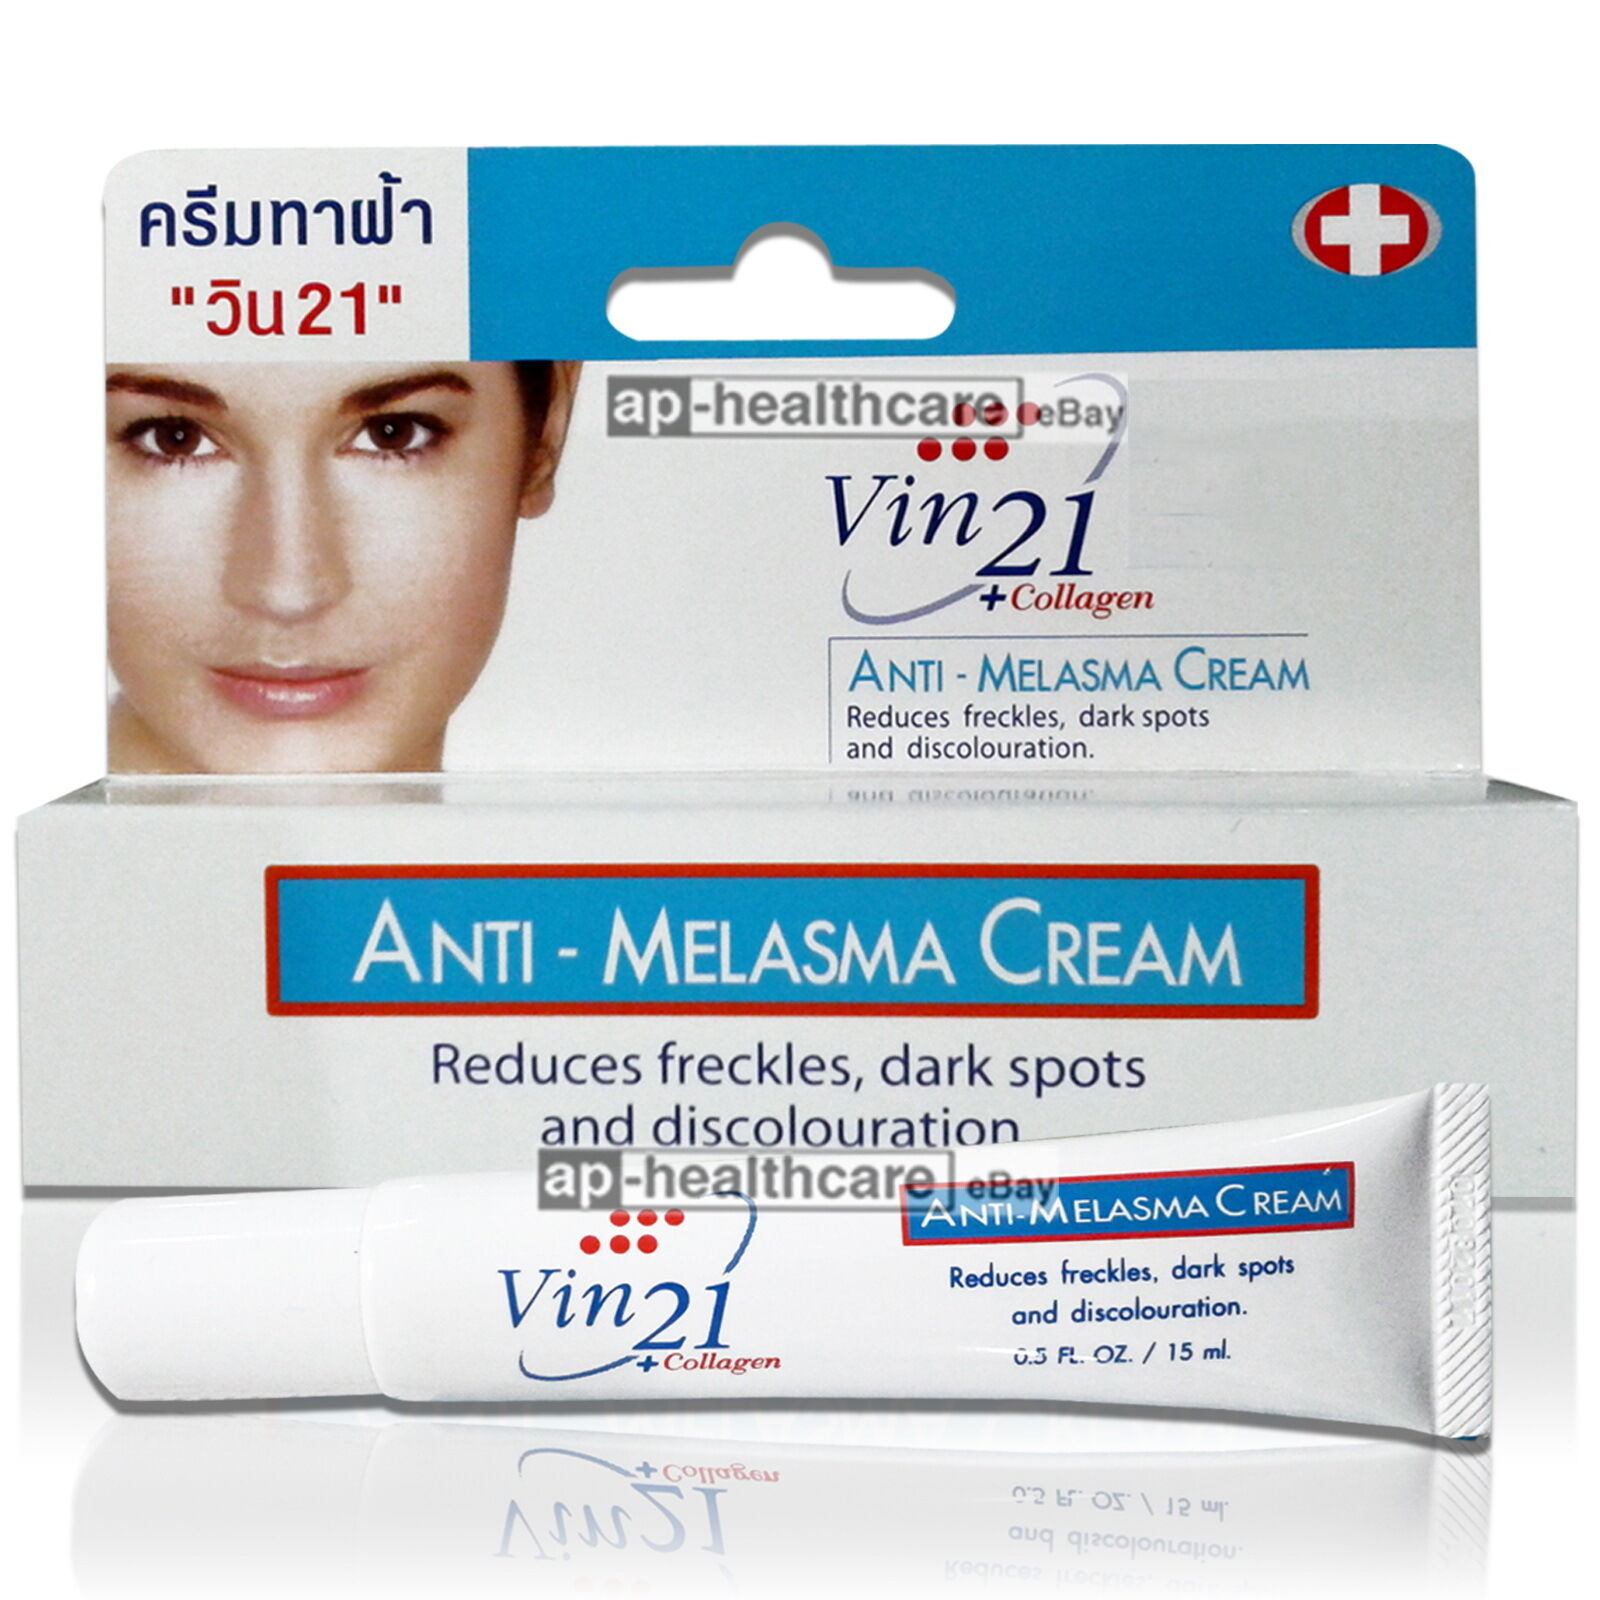 anti melasma cream tranexamic acid arbutin reduce dark spots hyperpigmentation 8853998005043 ebay. Black Bedroom Furniture Sets. Home Design Ideas